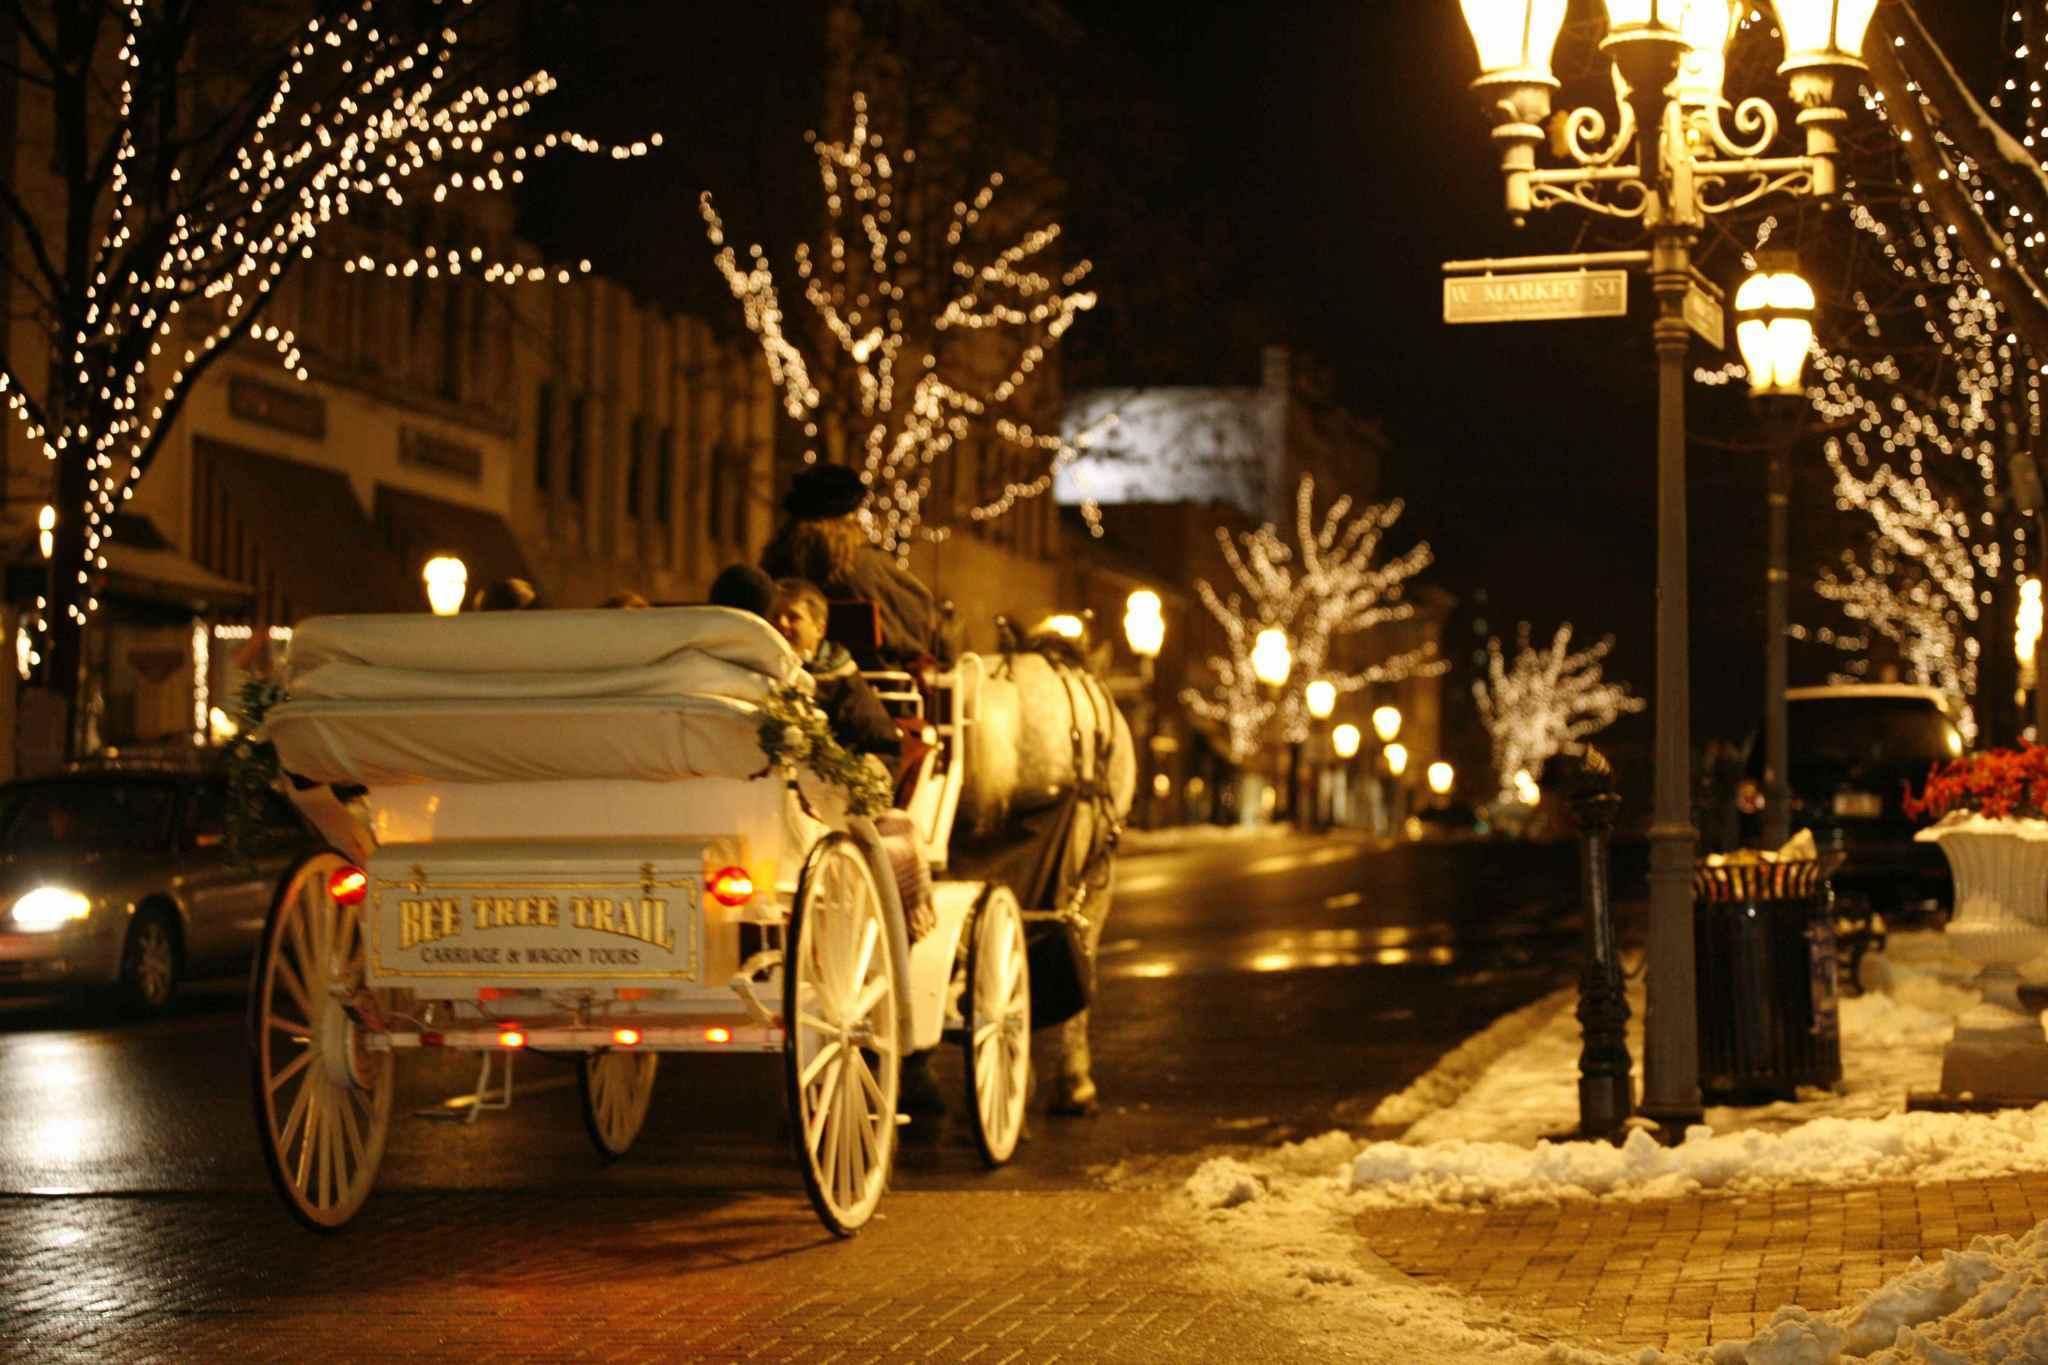 Bethlehem Christmas Market 2013